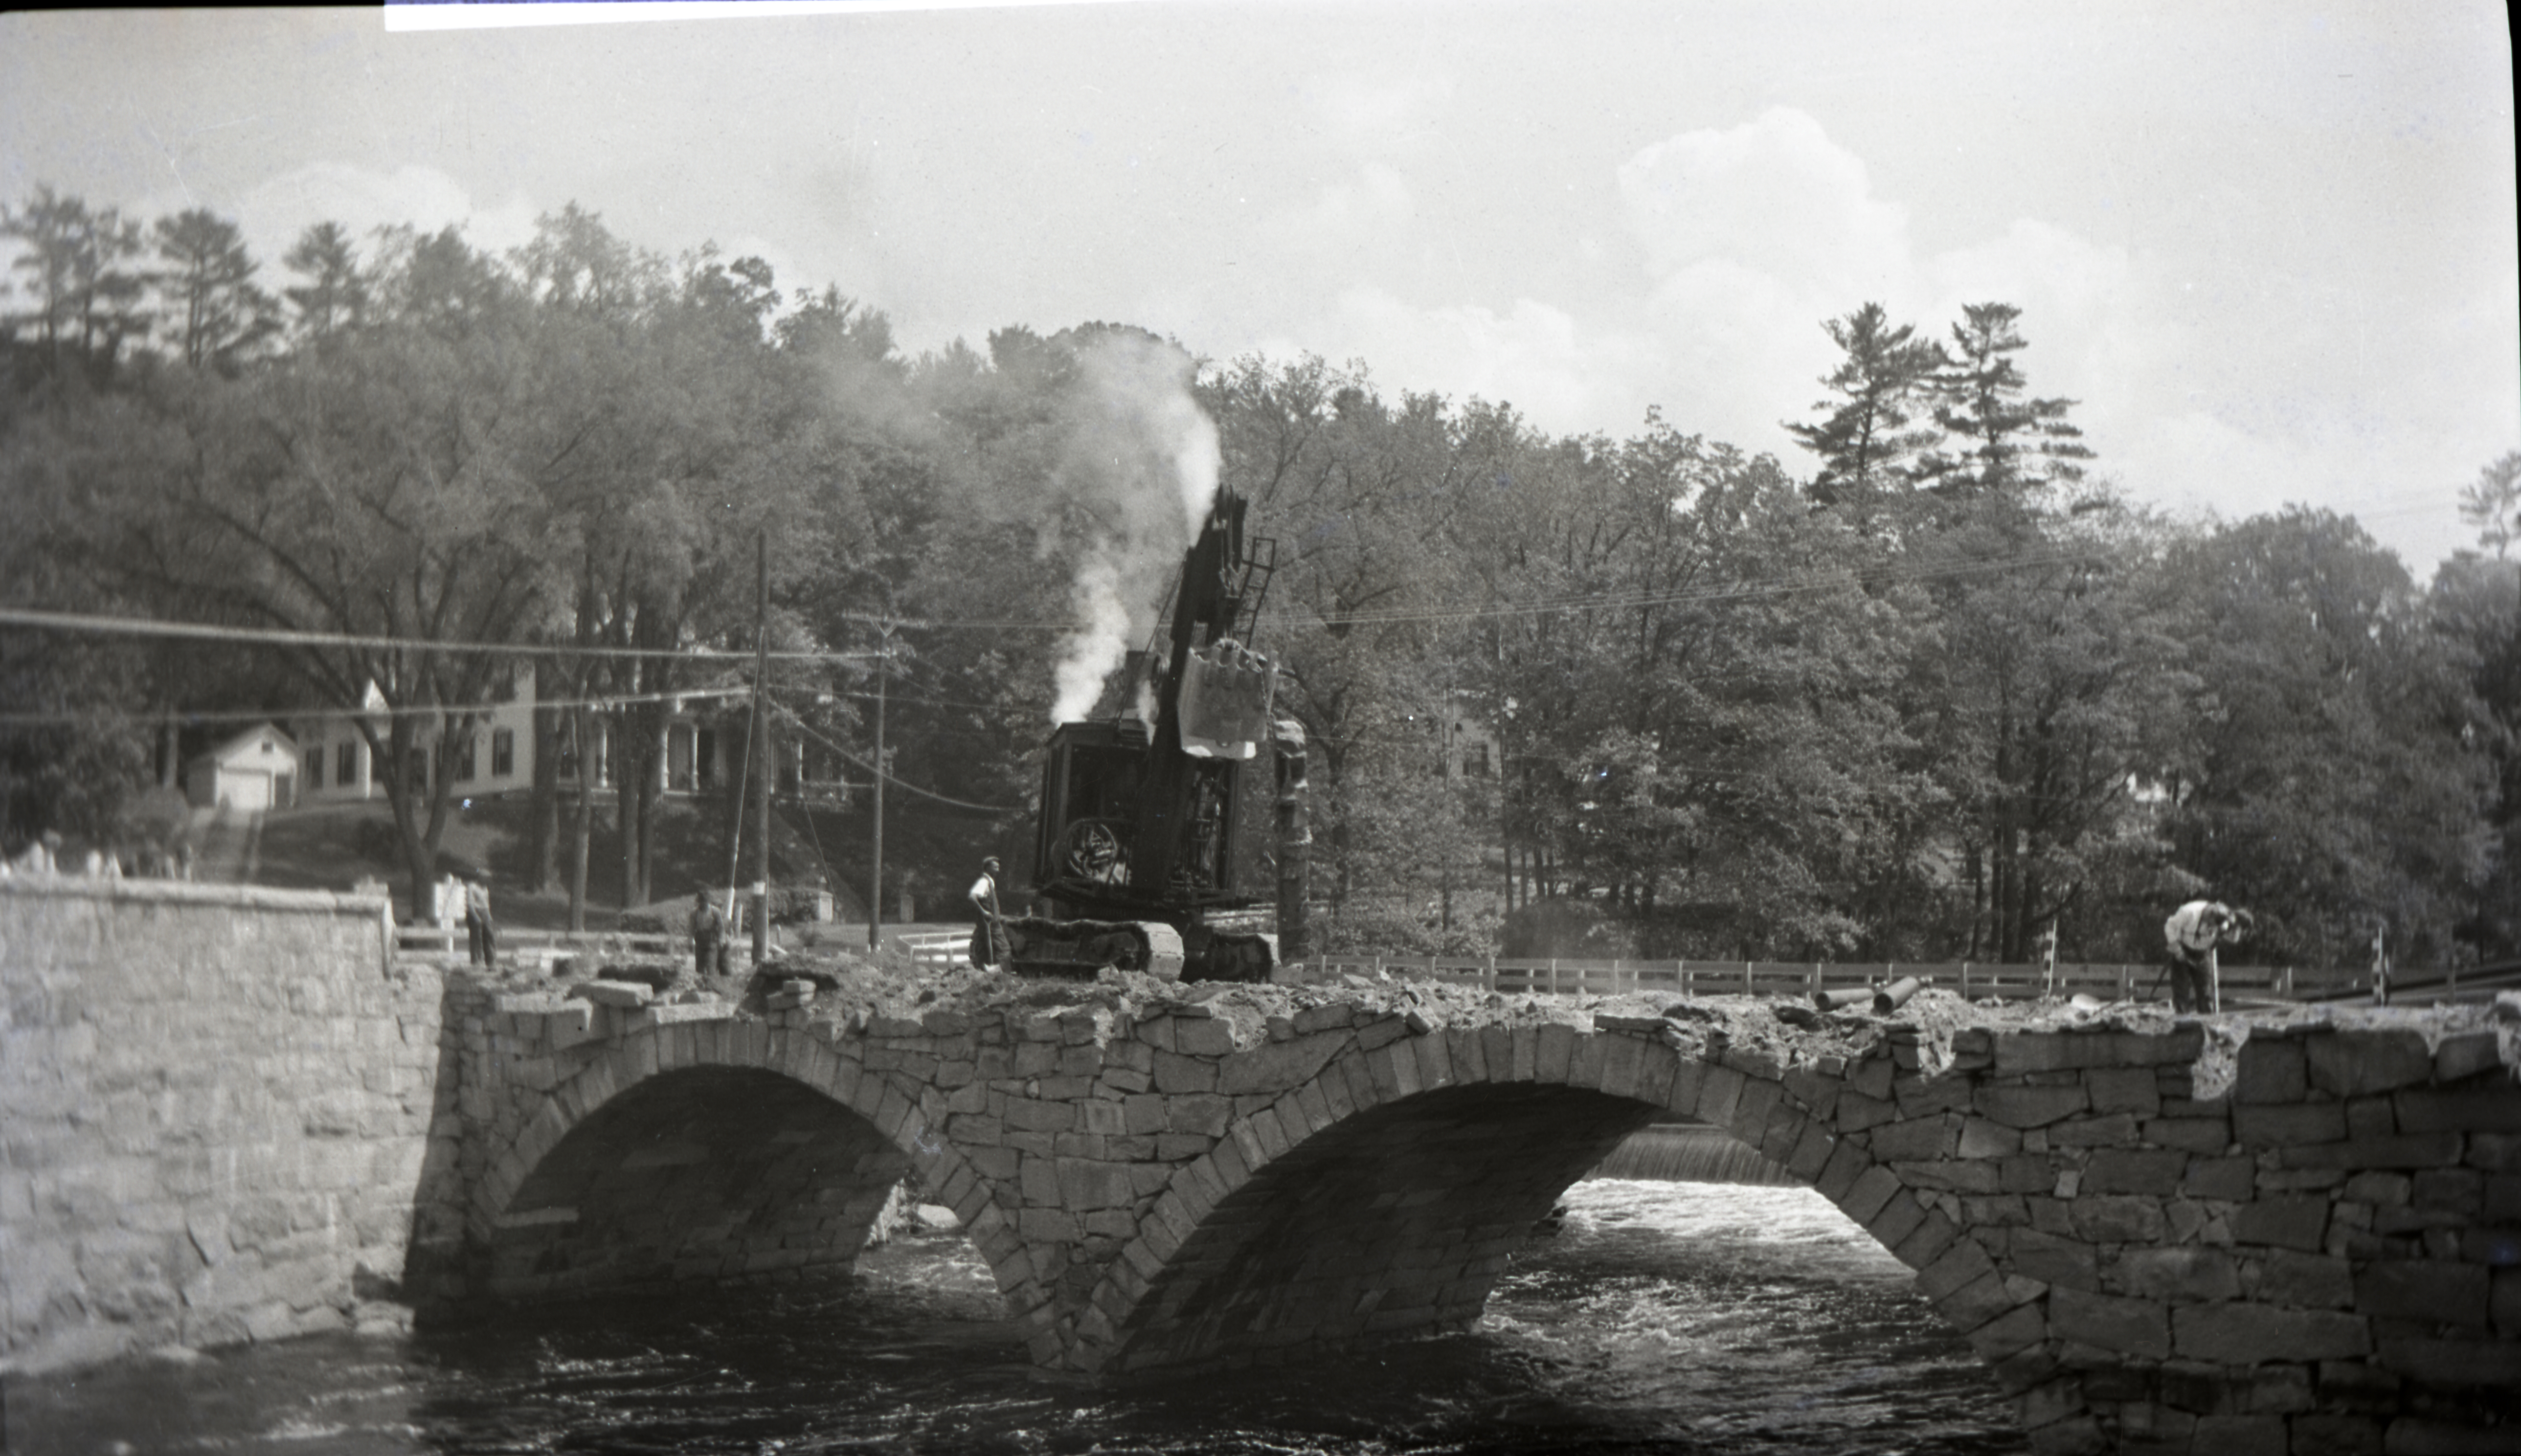 1940 Bridge Construction - Demo of Existing Bridge